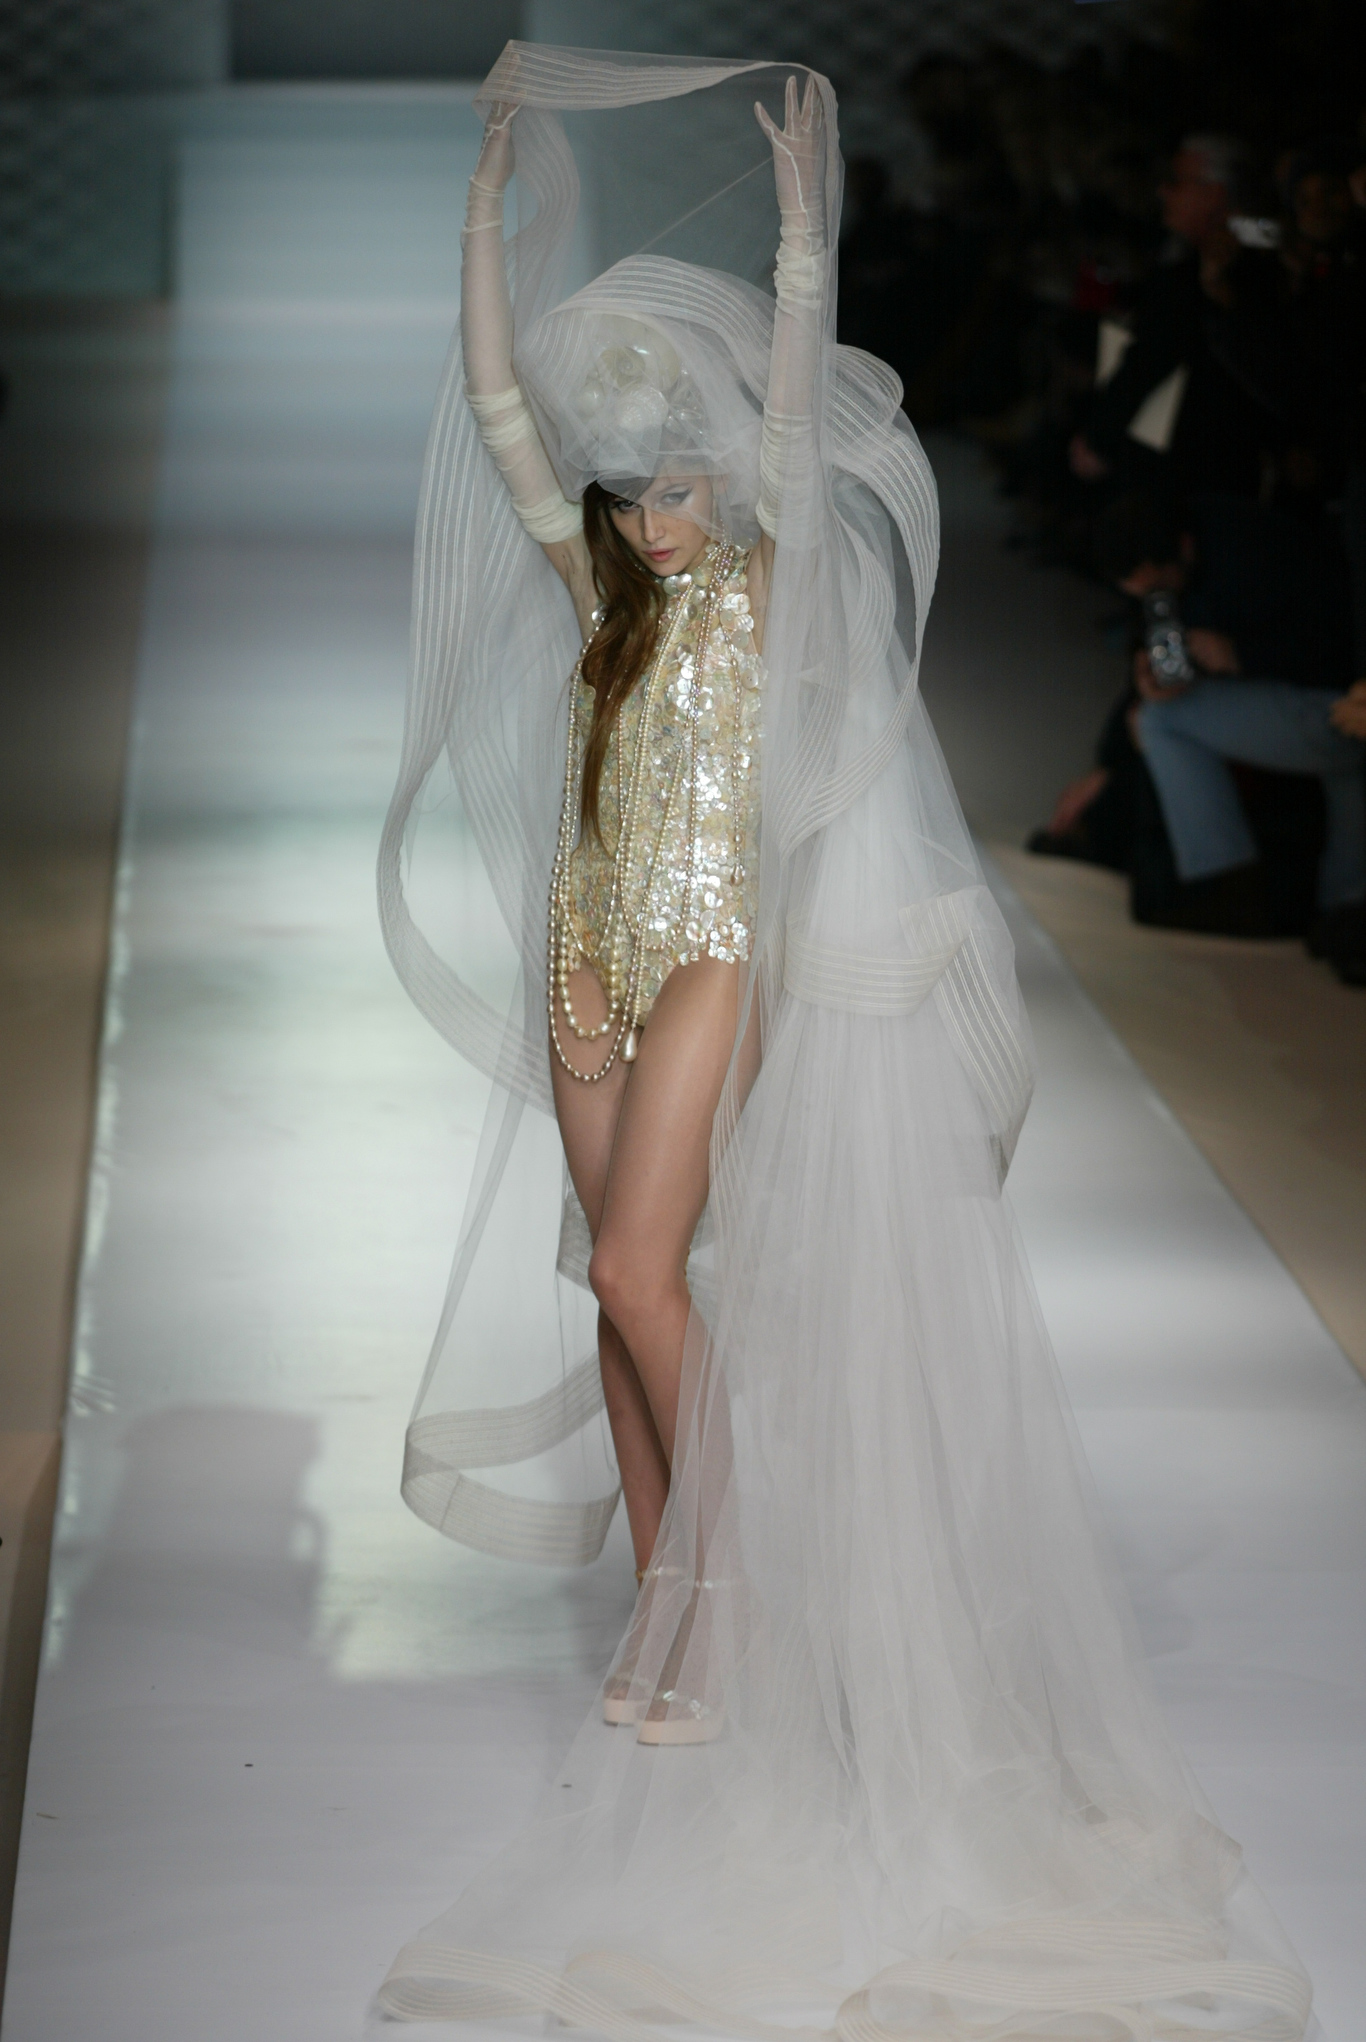 Exhibition of Jean Paul Gaultier Wedding Gowns Opening in Belgrade – WWD